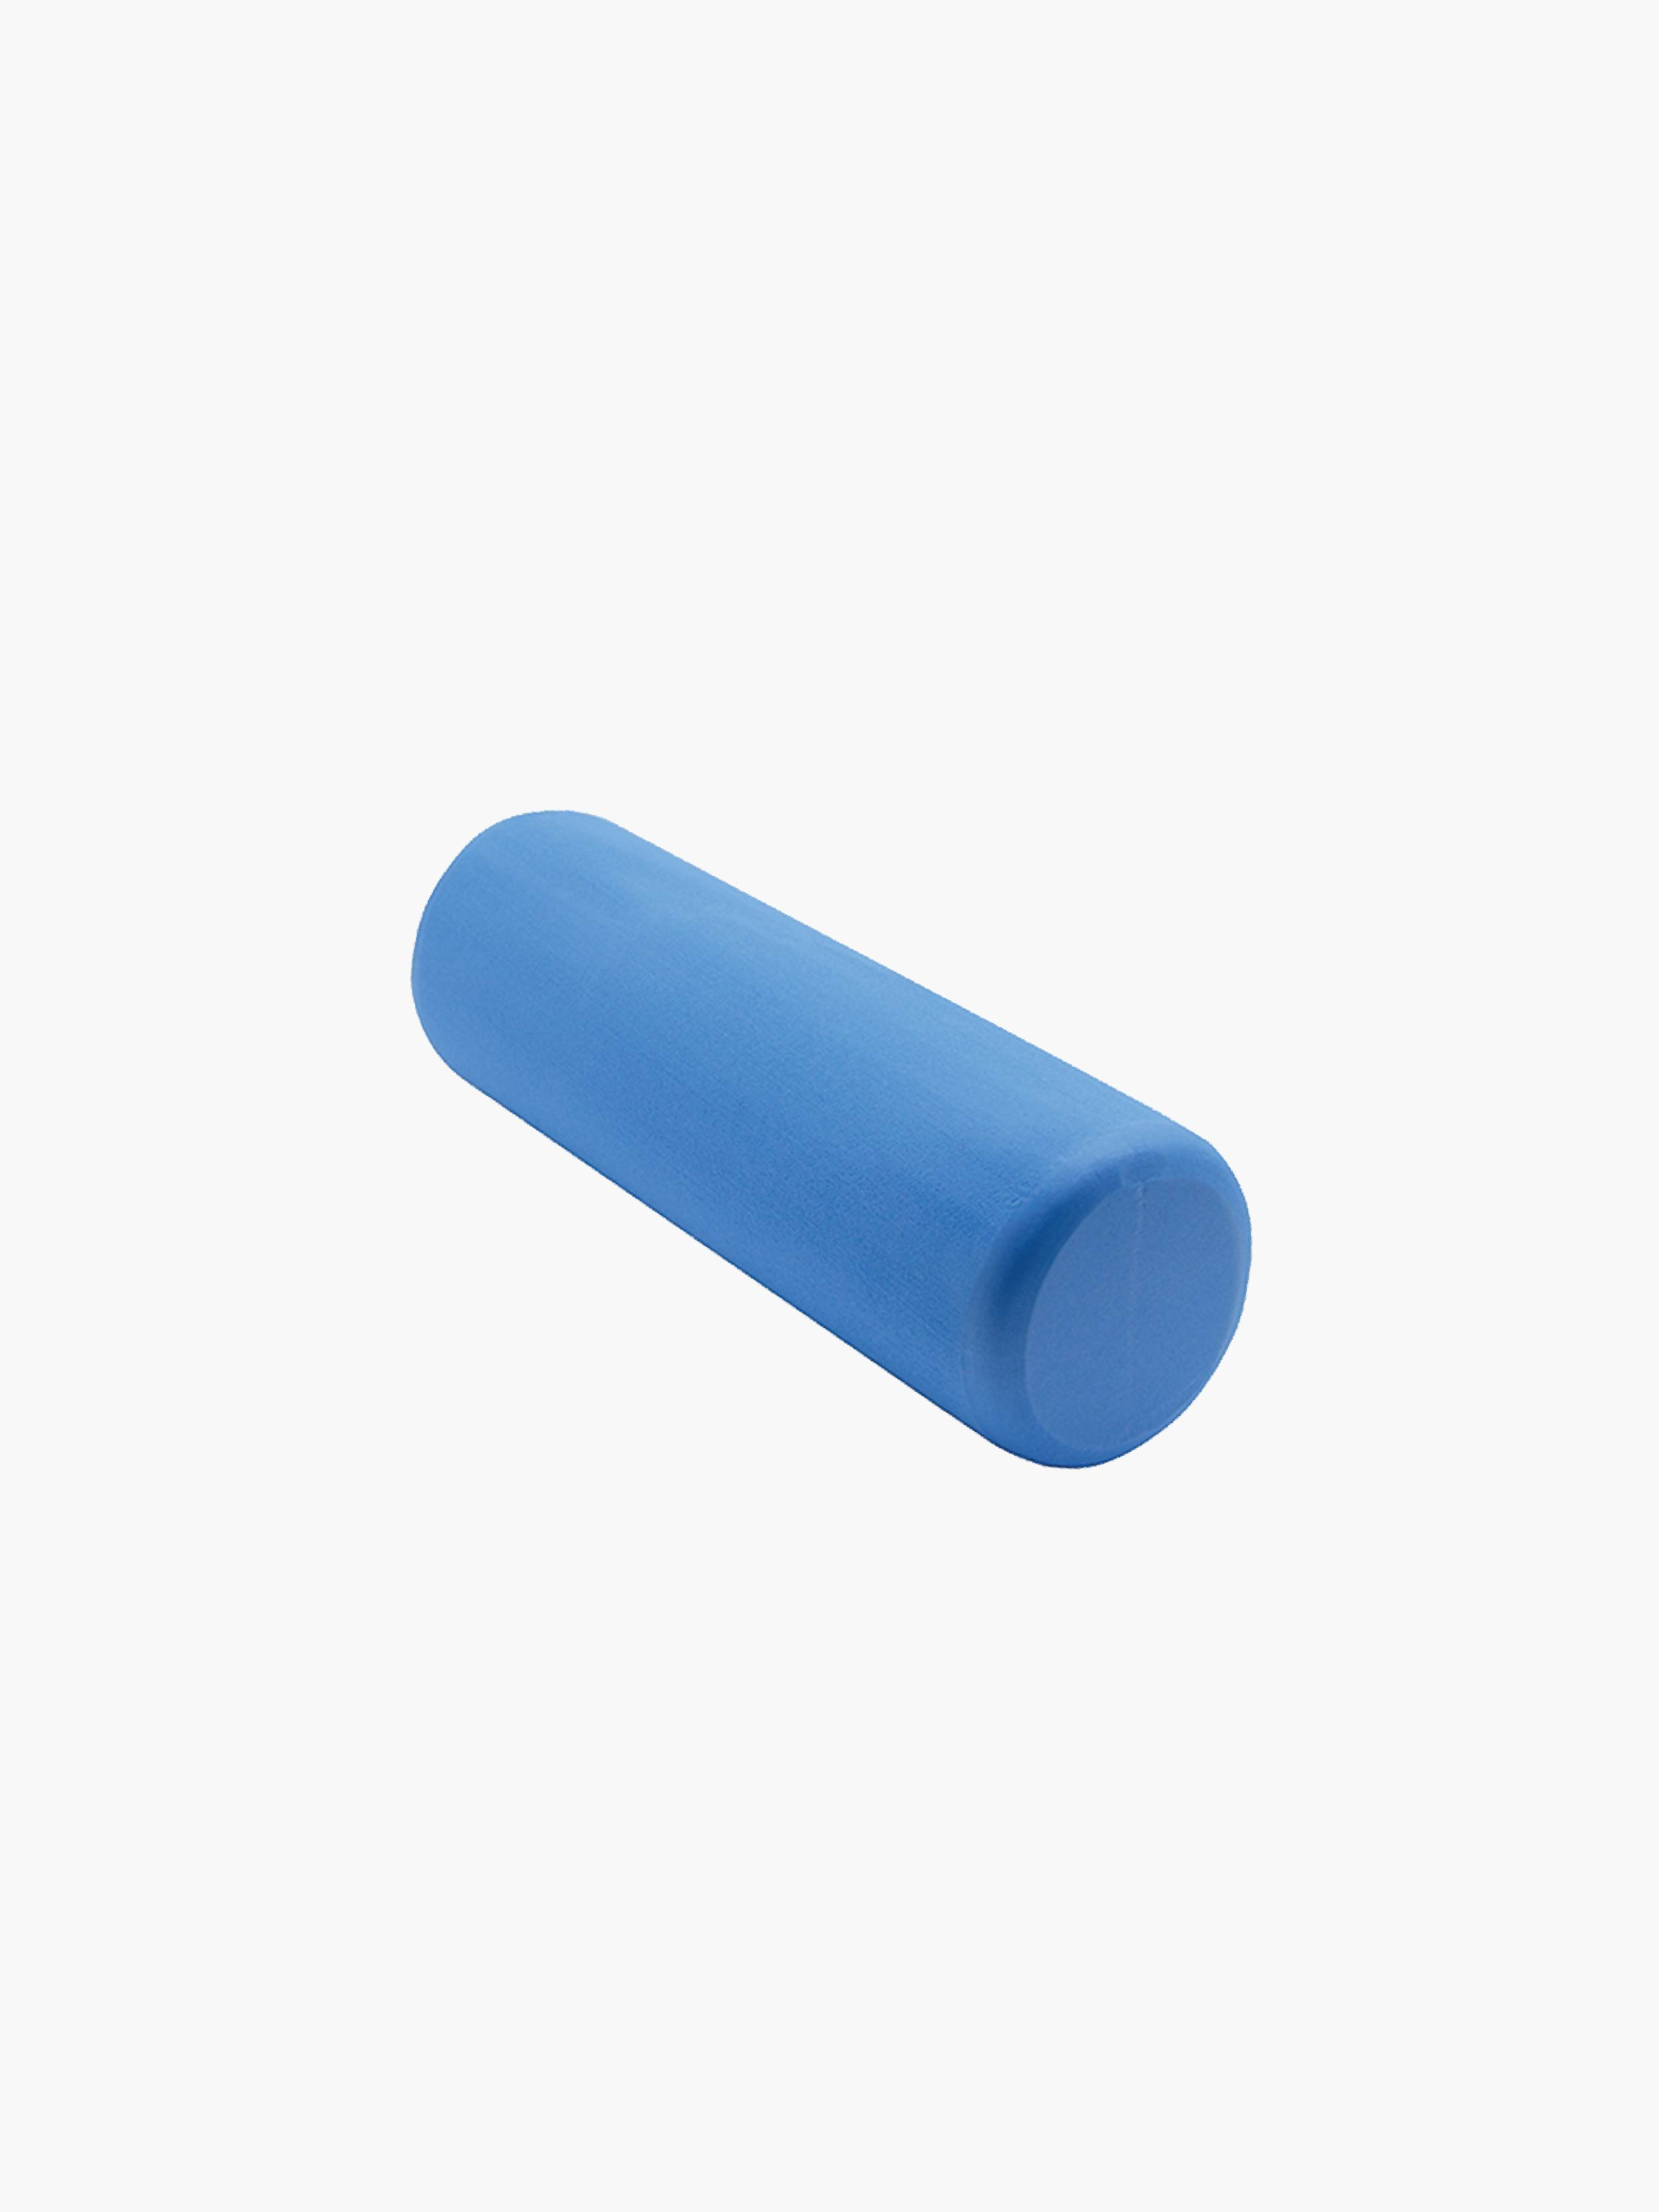 Standard Density Foam Roller 45 90cm Stayfithk